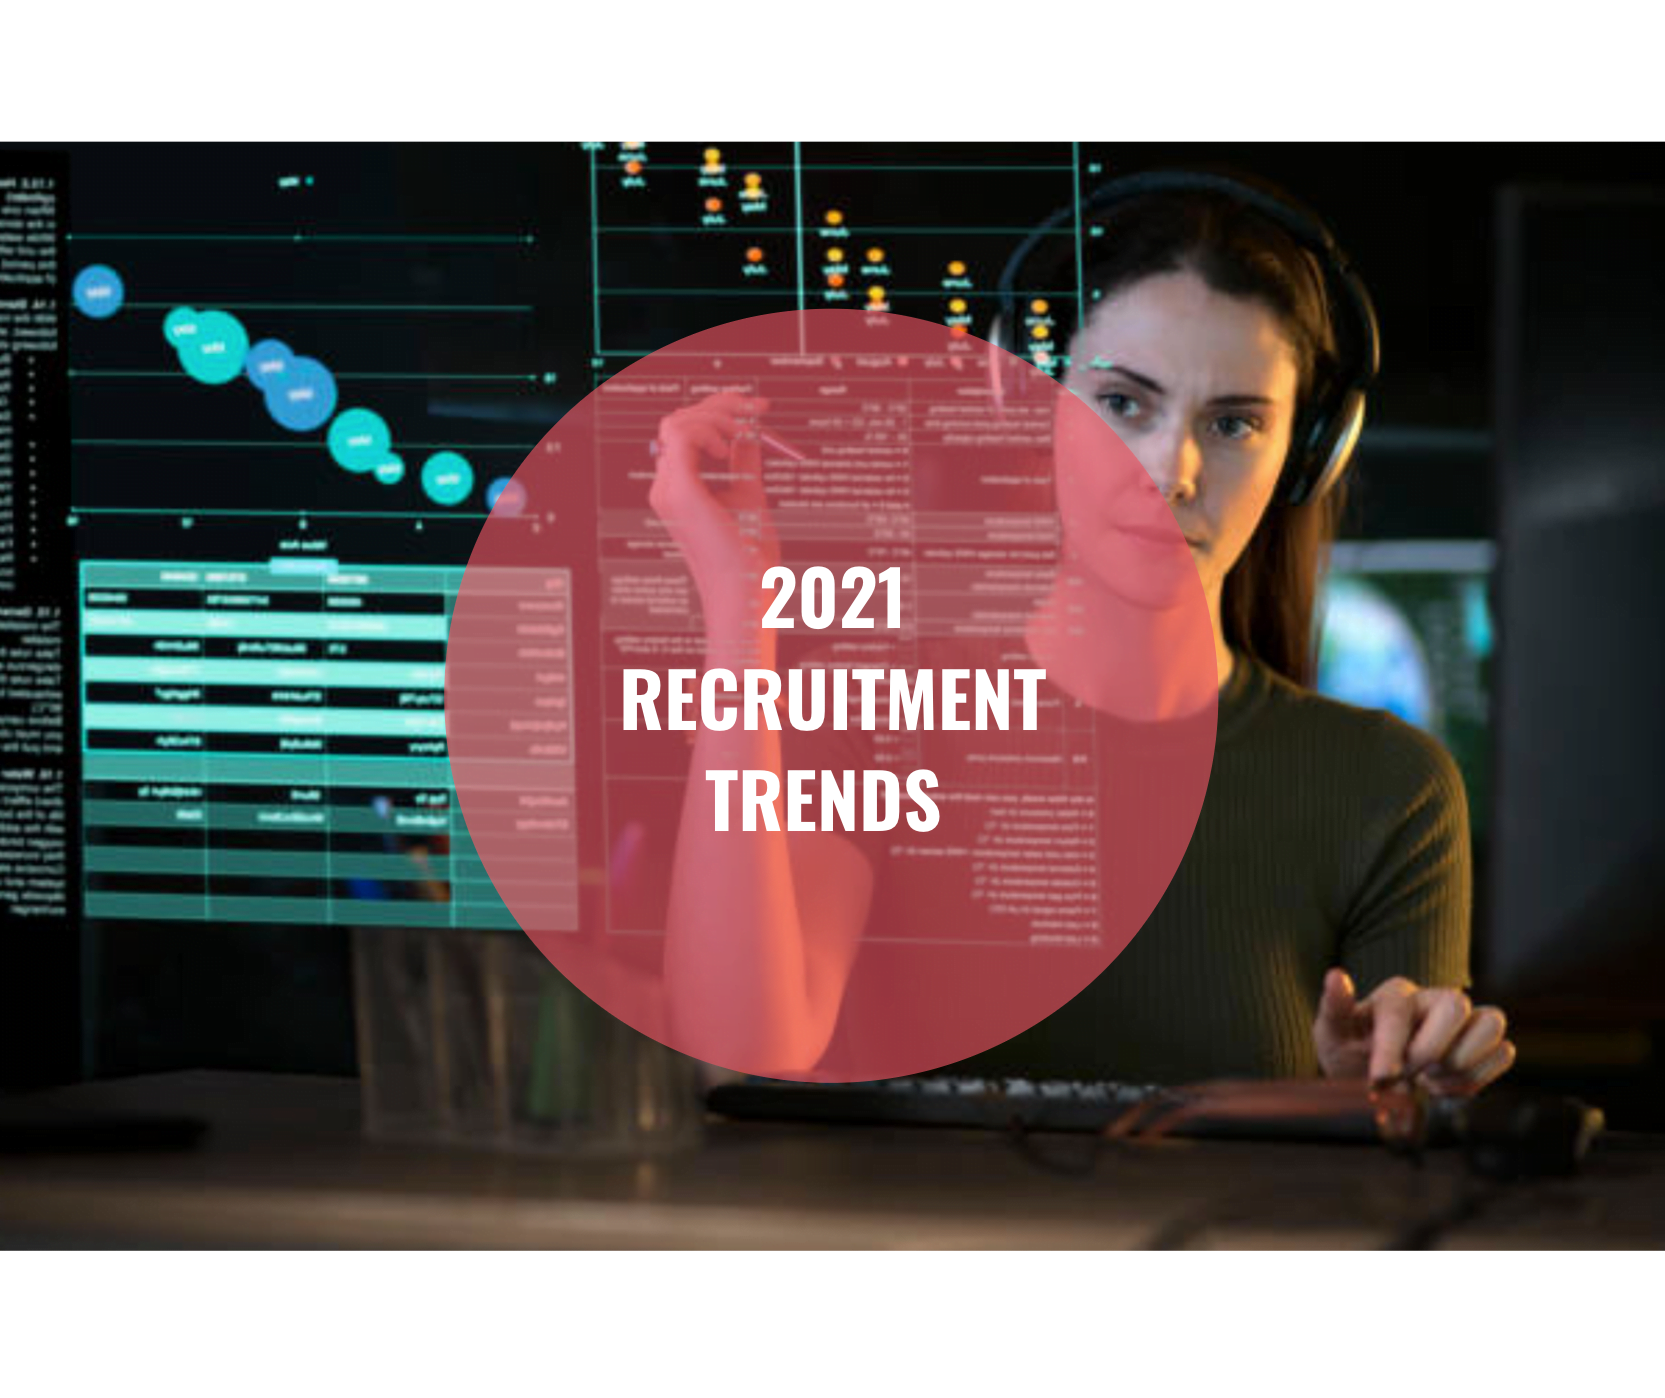 Recruitment Trends 2021